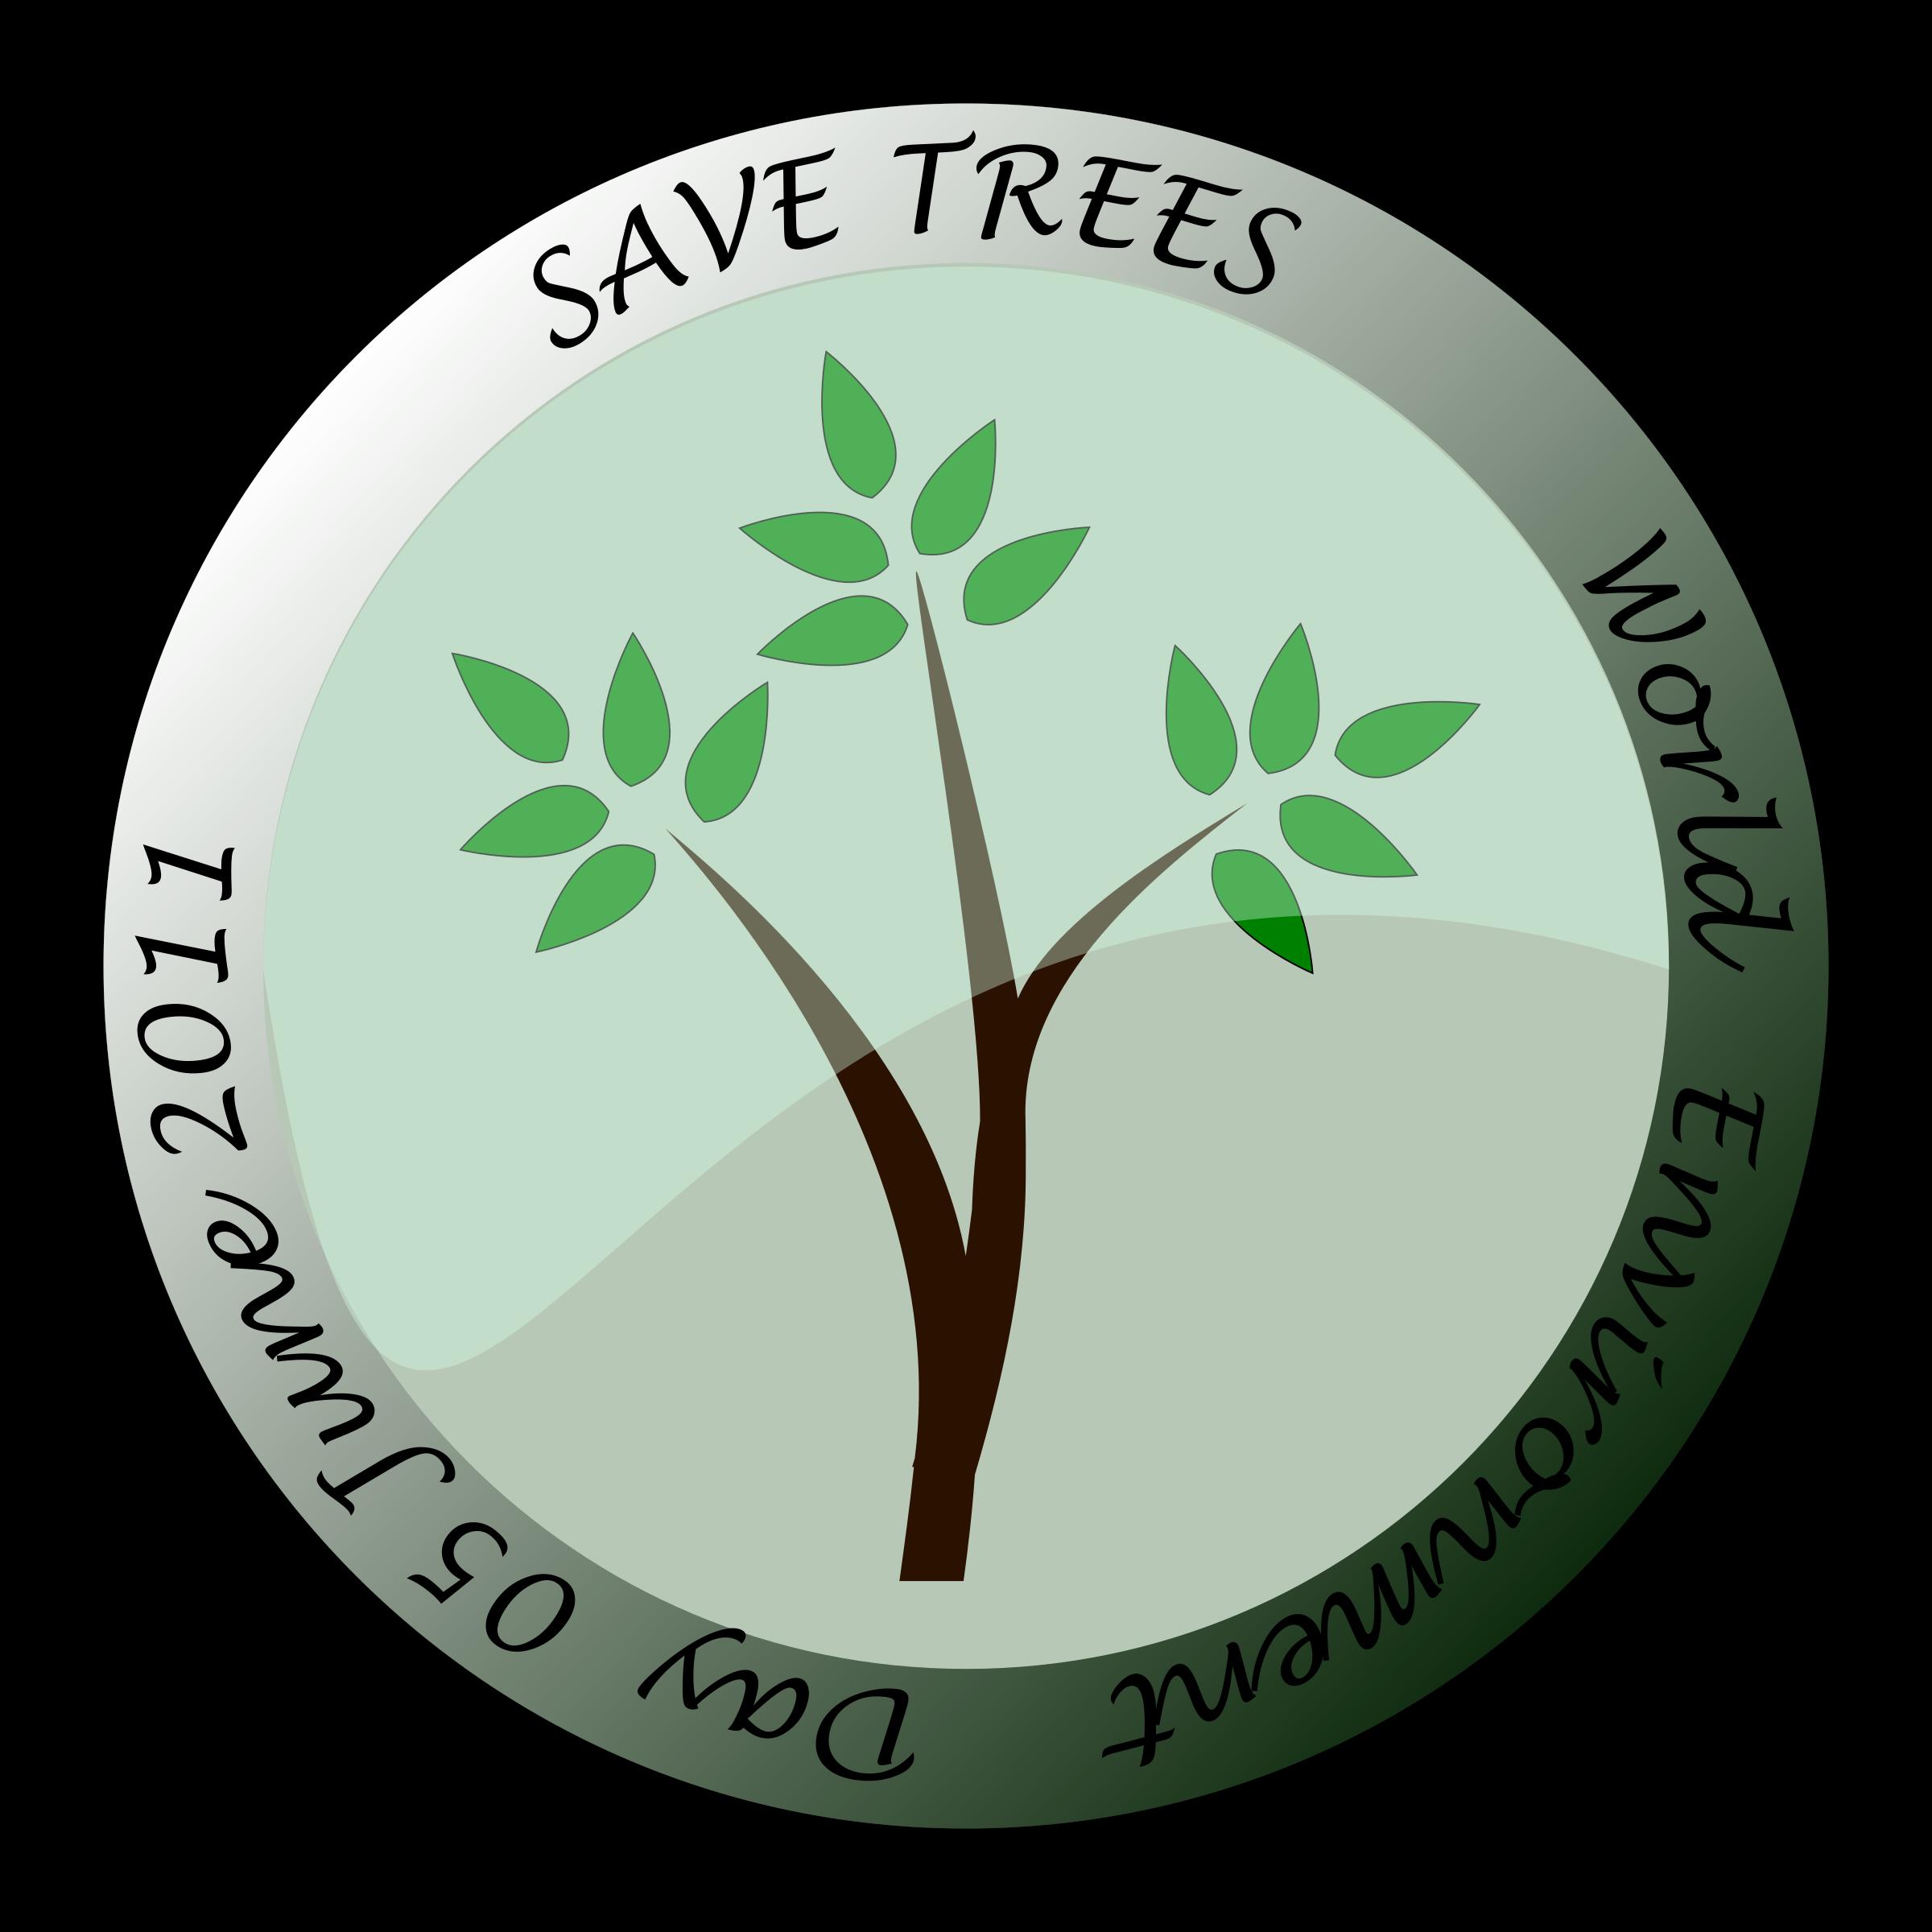 Environment clipart love environment. Natural world day symbol